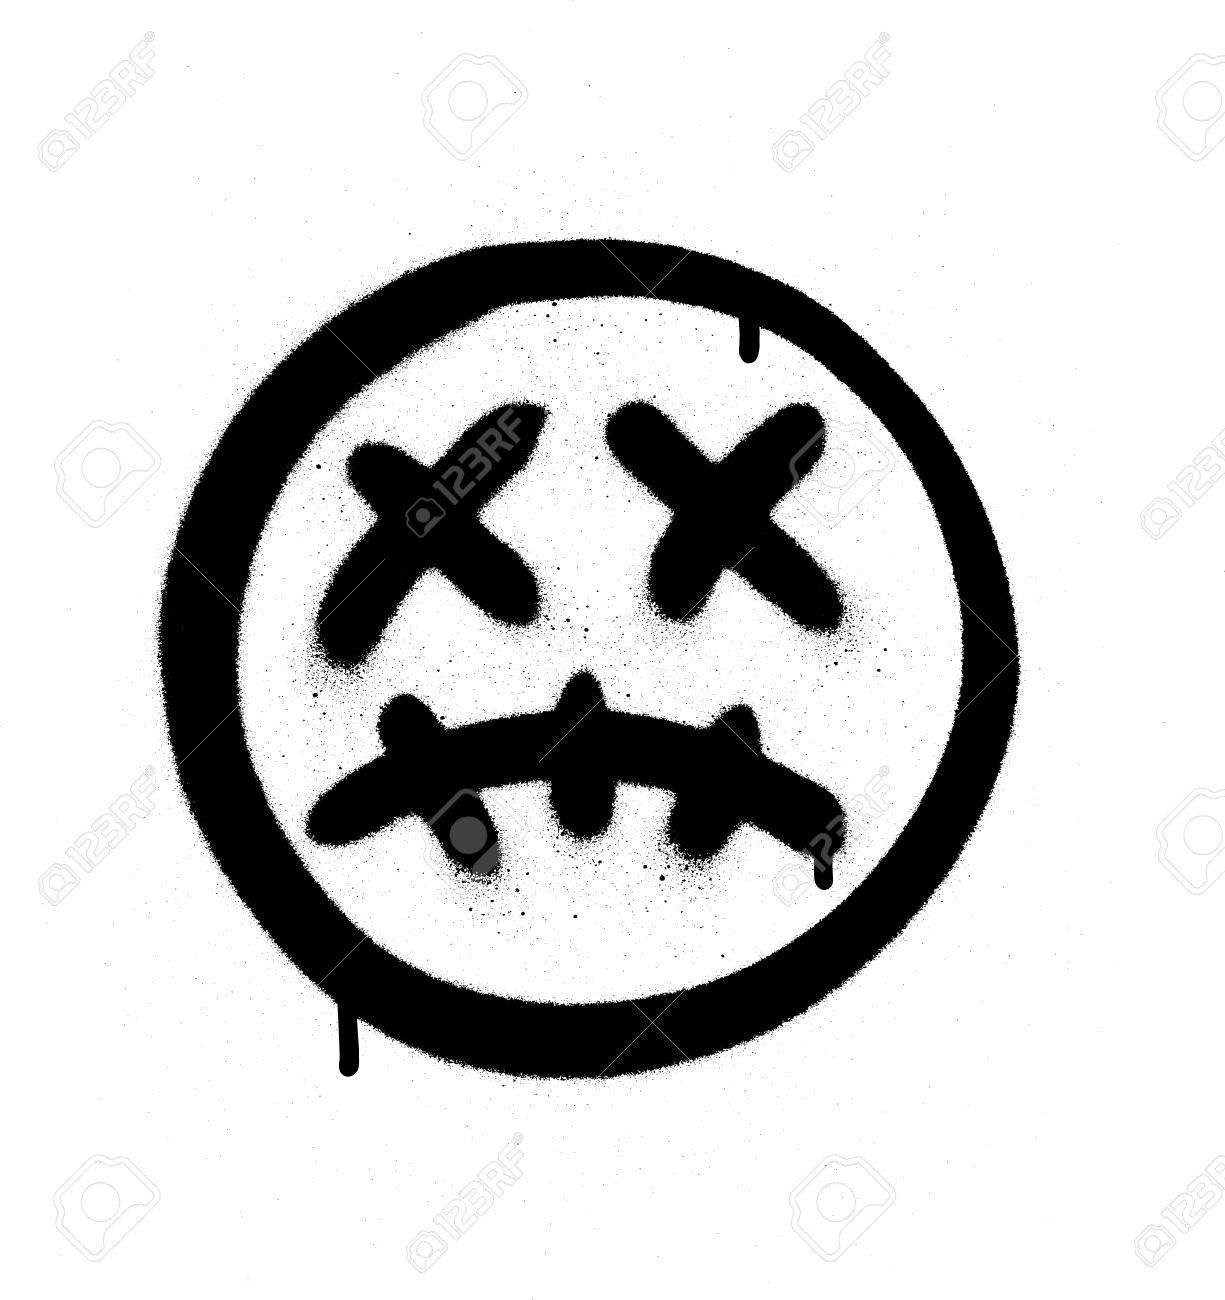 Graffiti scary sick emoji sprayed in black on white stock vector 83305732